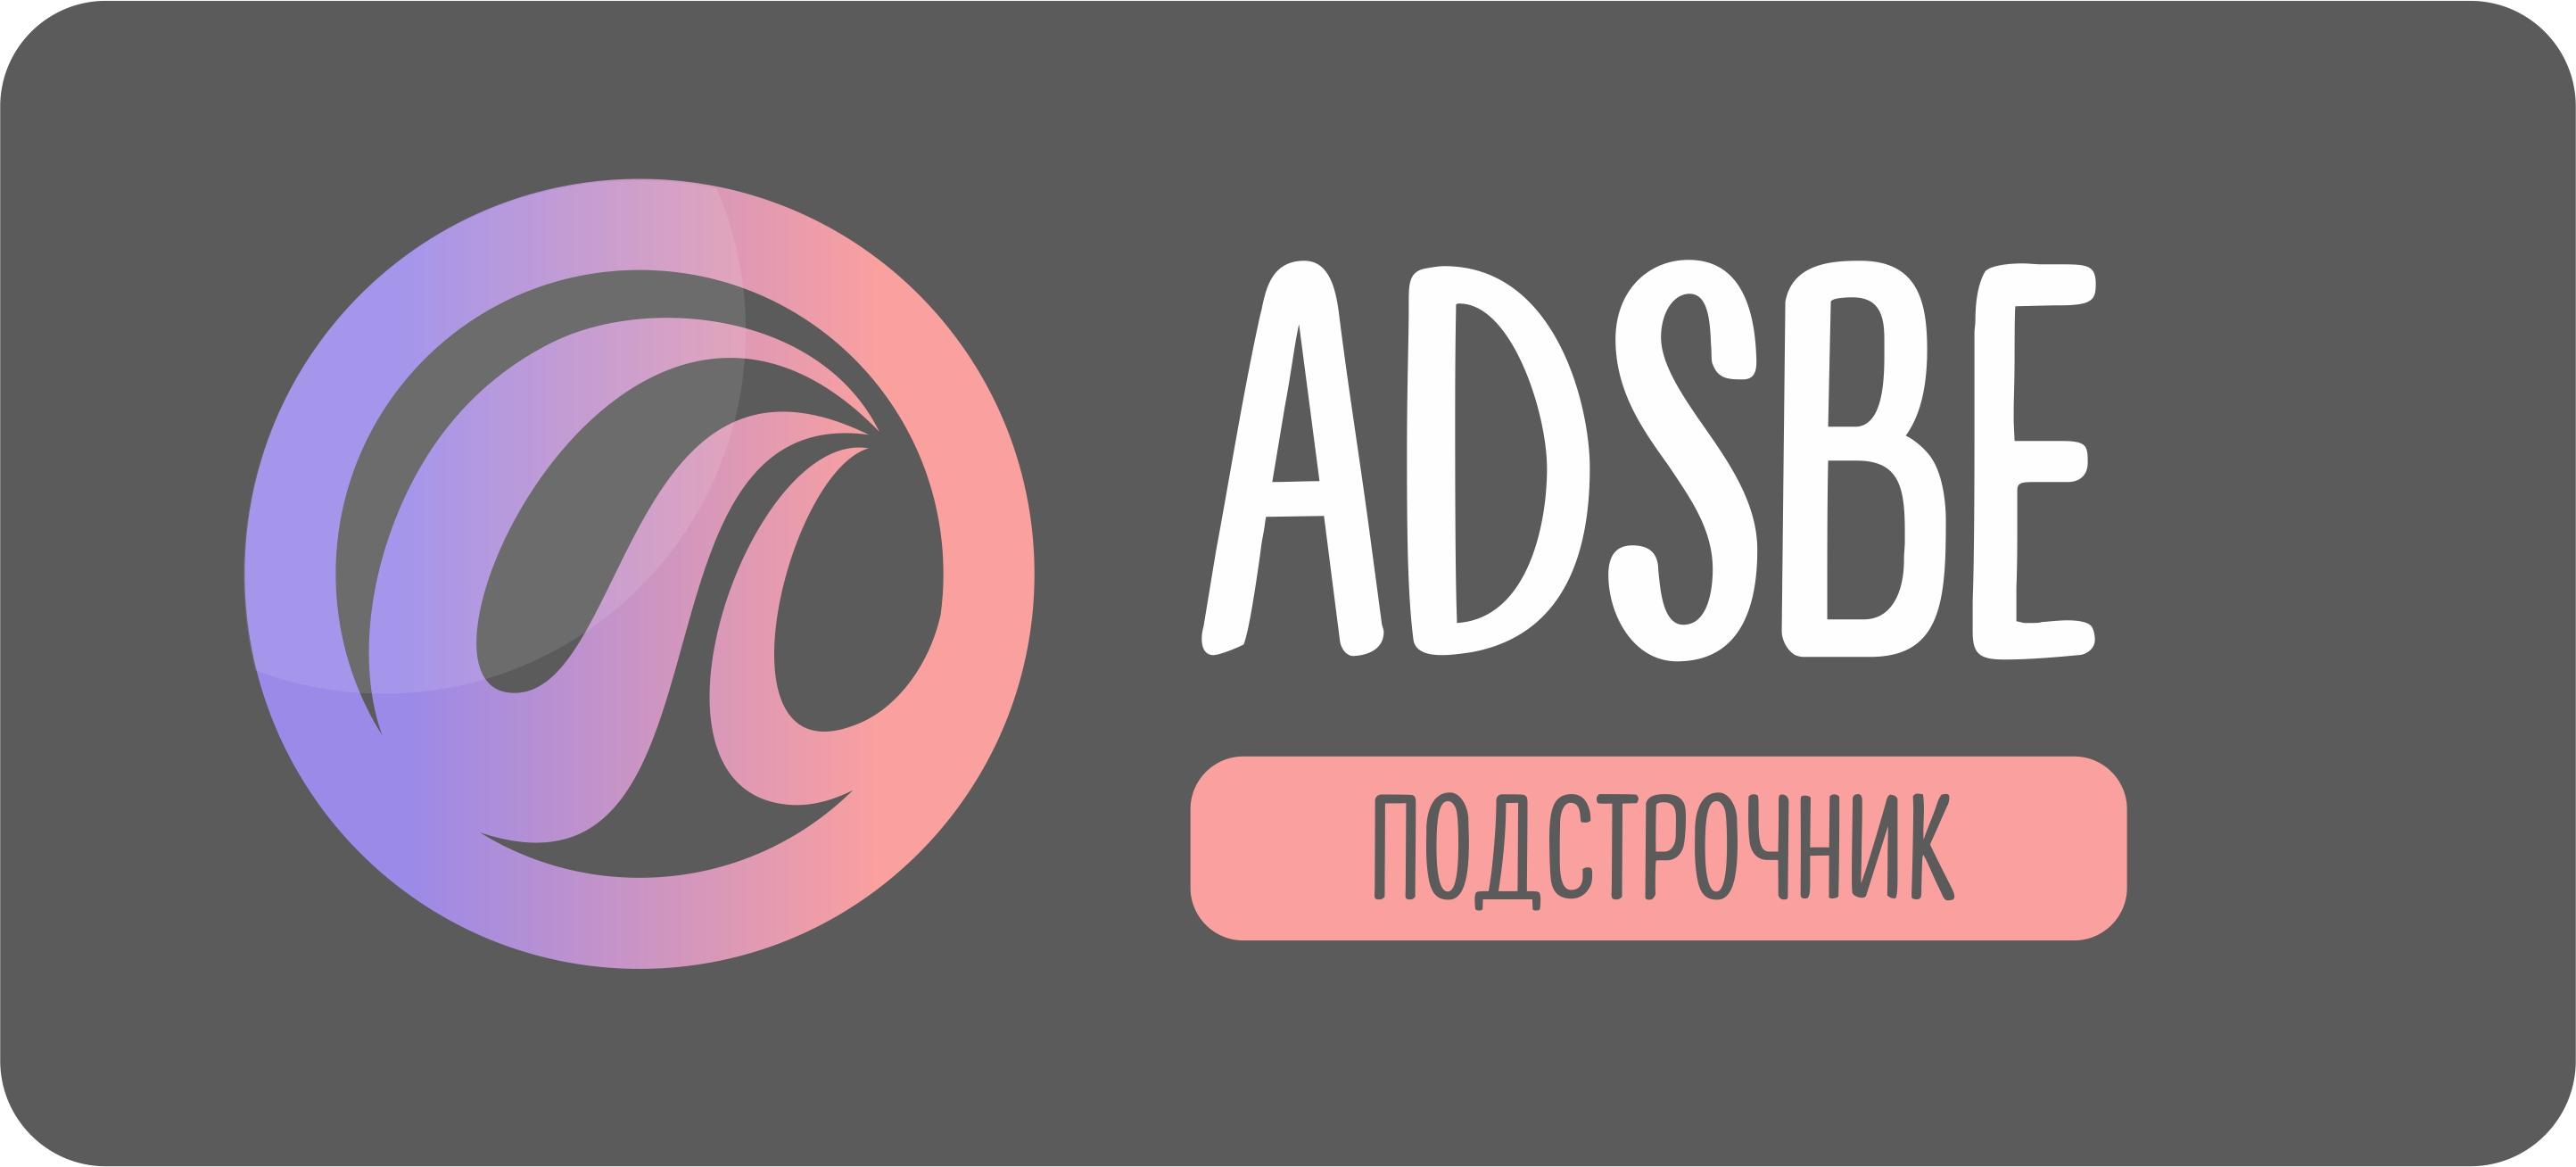 Разработка логотипа для CPA-сети фото f_0955878f2d95a851.jpg